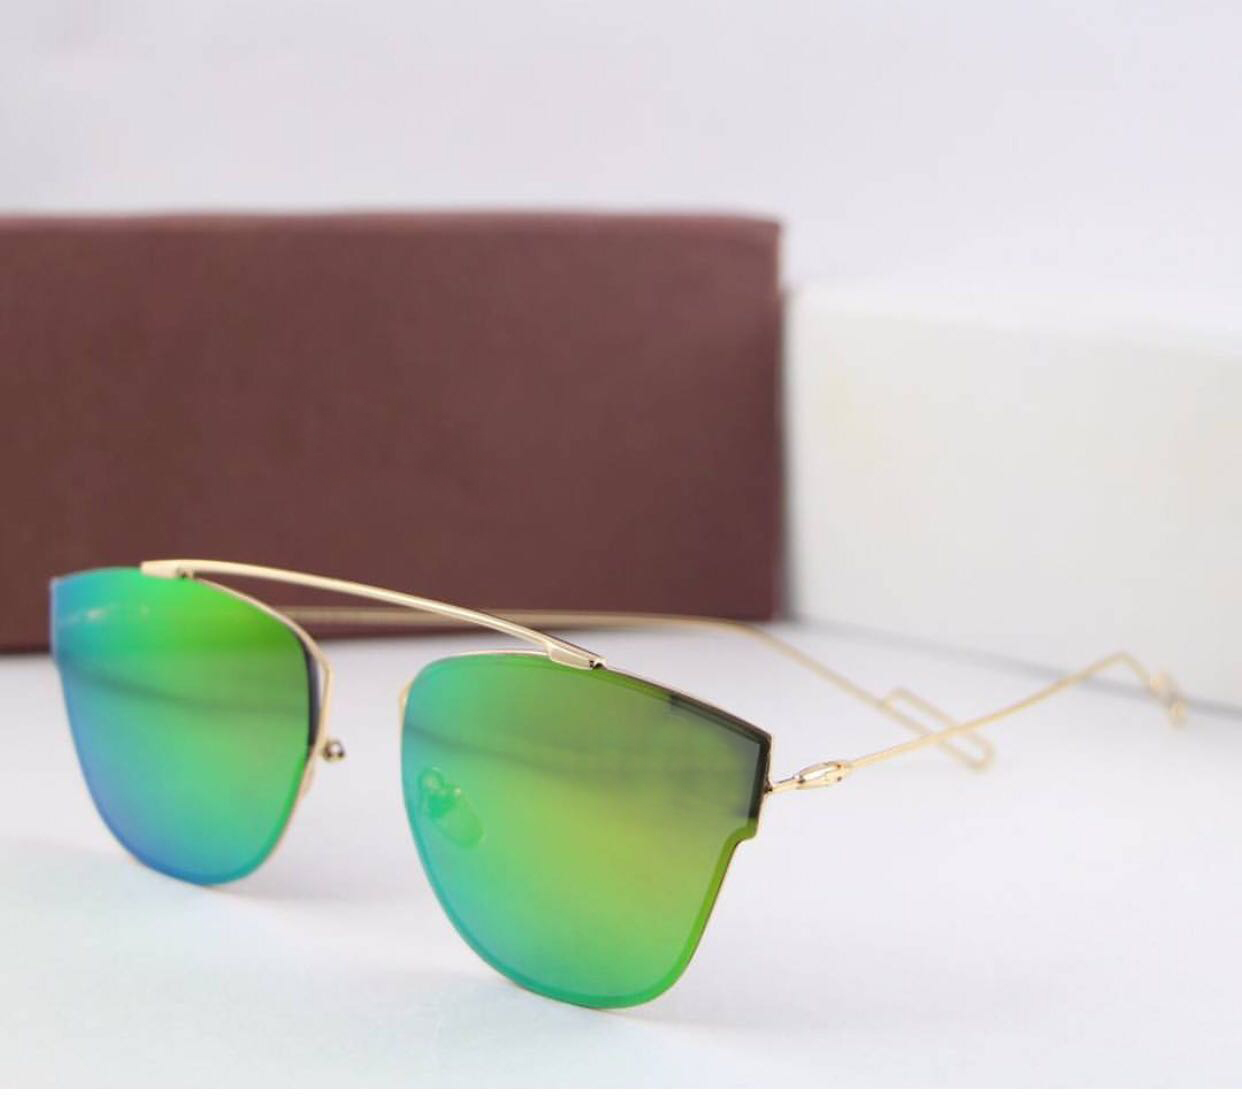 luxurystore Golden And Gold Stylish Sunglasses W 1411